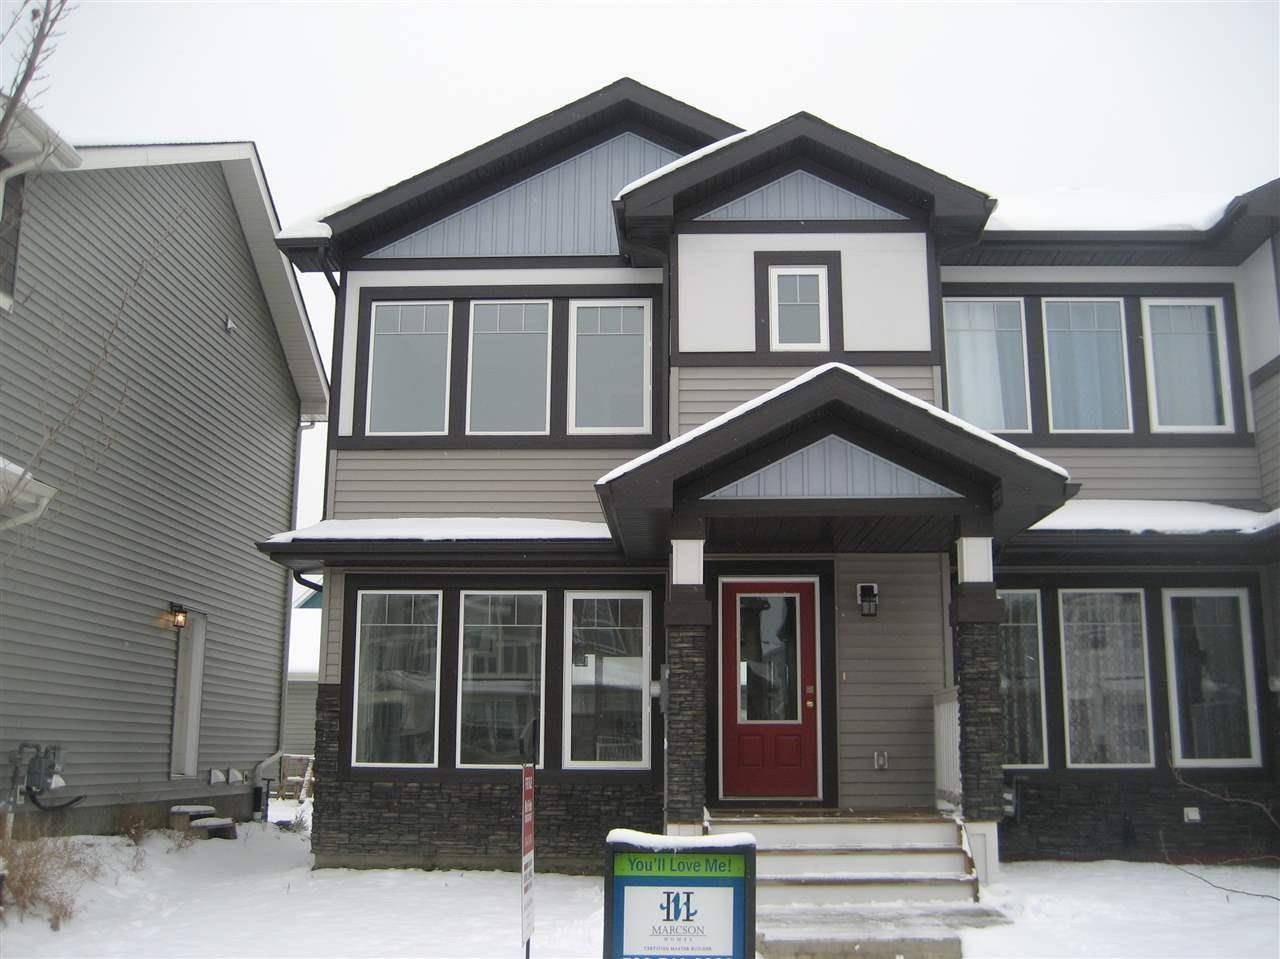 House for sale at 390 Allard Blvd Sw Edmonton Alberta - MLS: E4177851